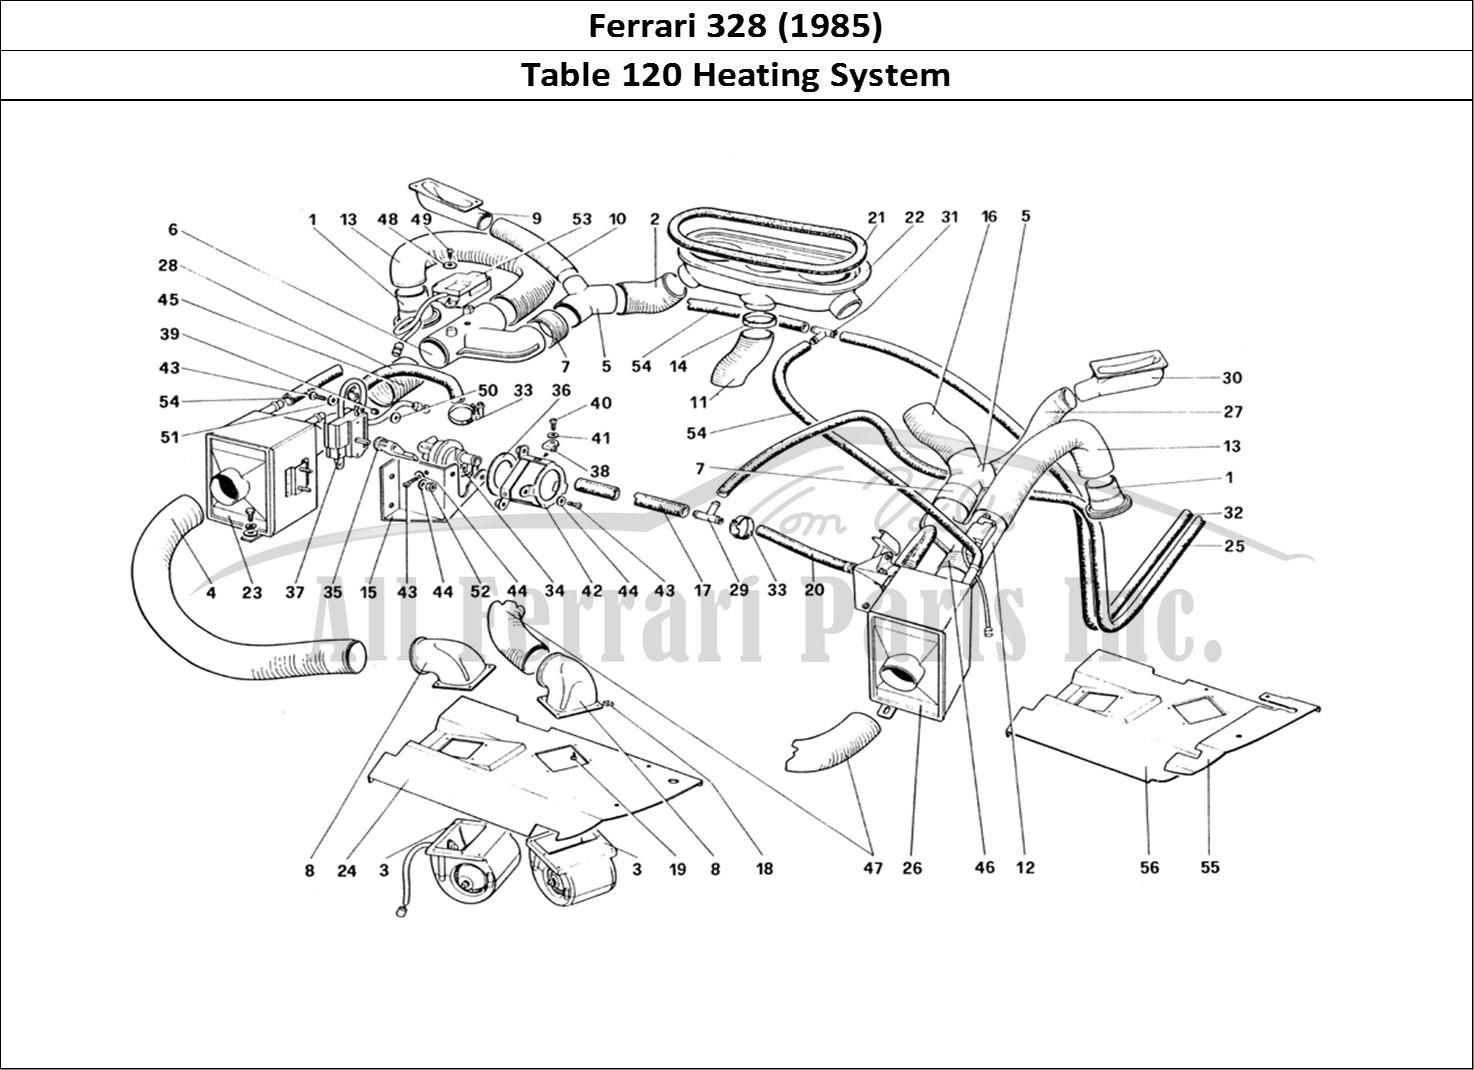 Buy Original Ferrari 328 120 Heating System Ferrari